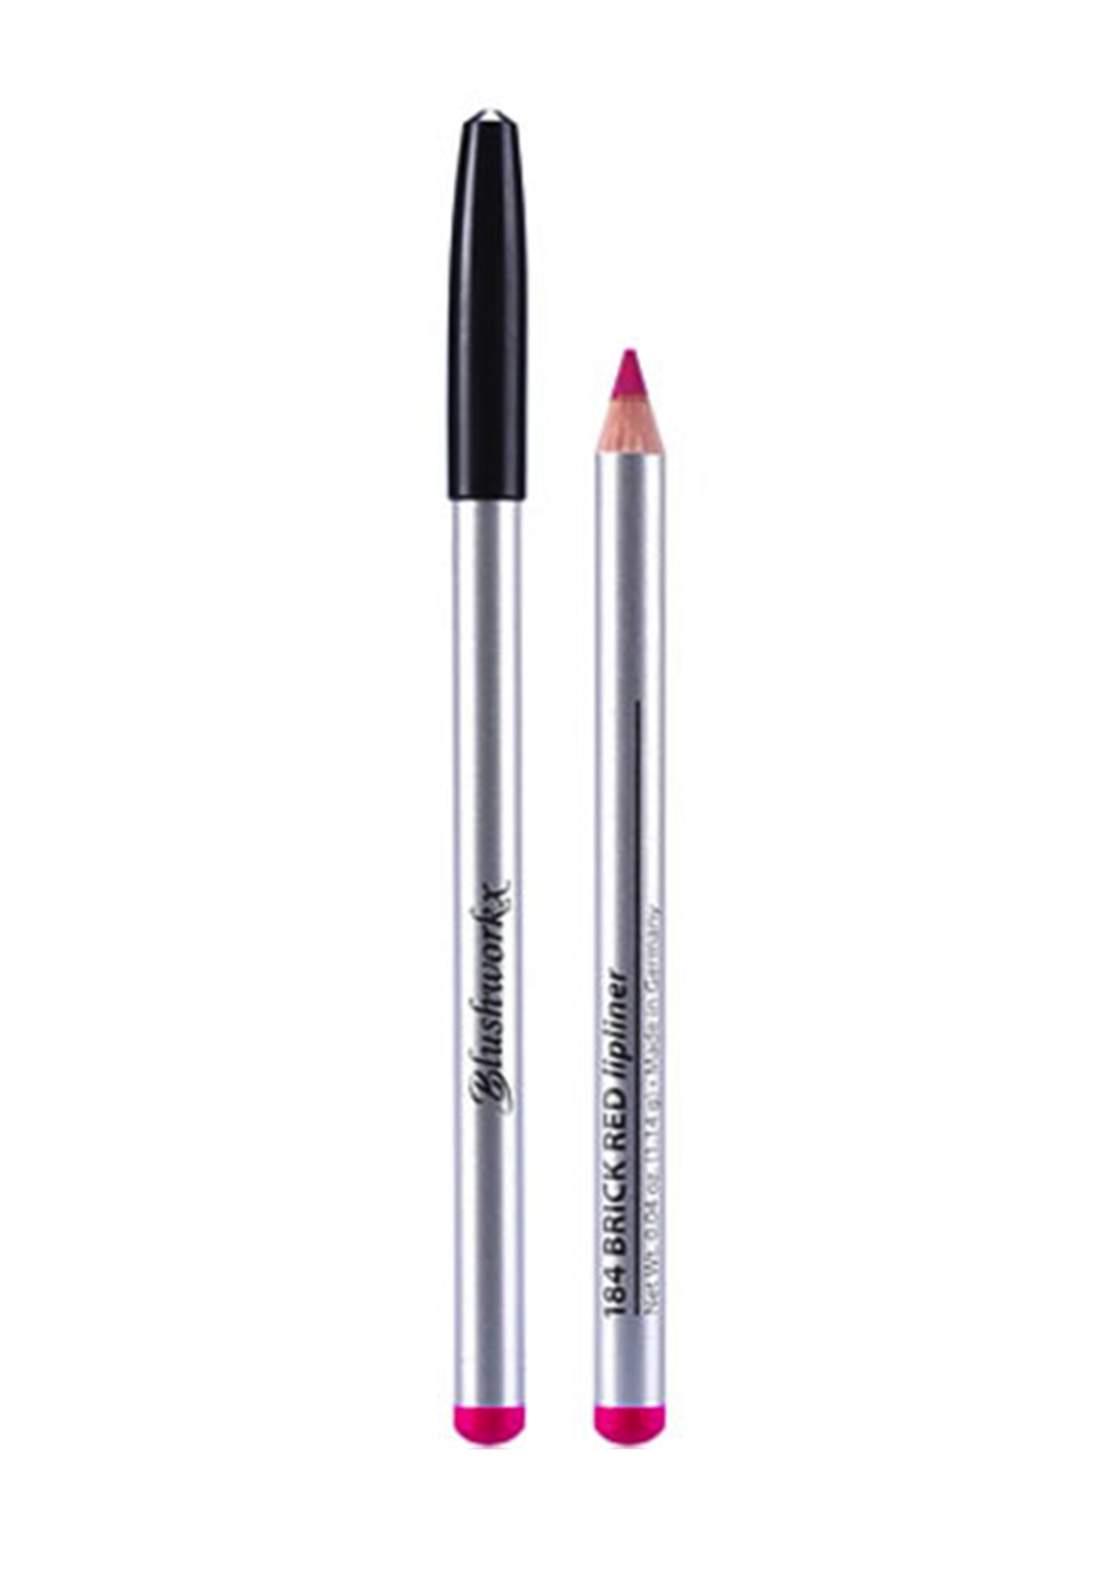 Blushworkx Hollywood Lip Liner Pencil No.189 Vivacious Pink 1.14g محدد الشفاه